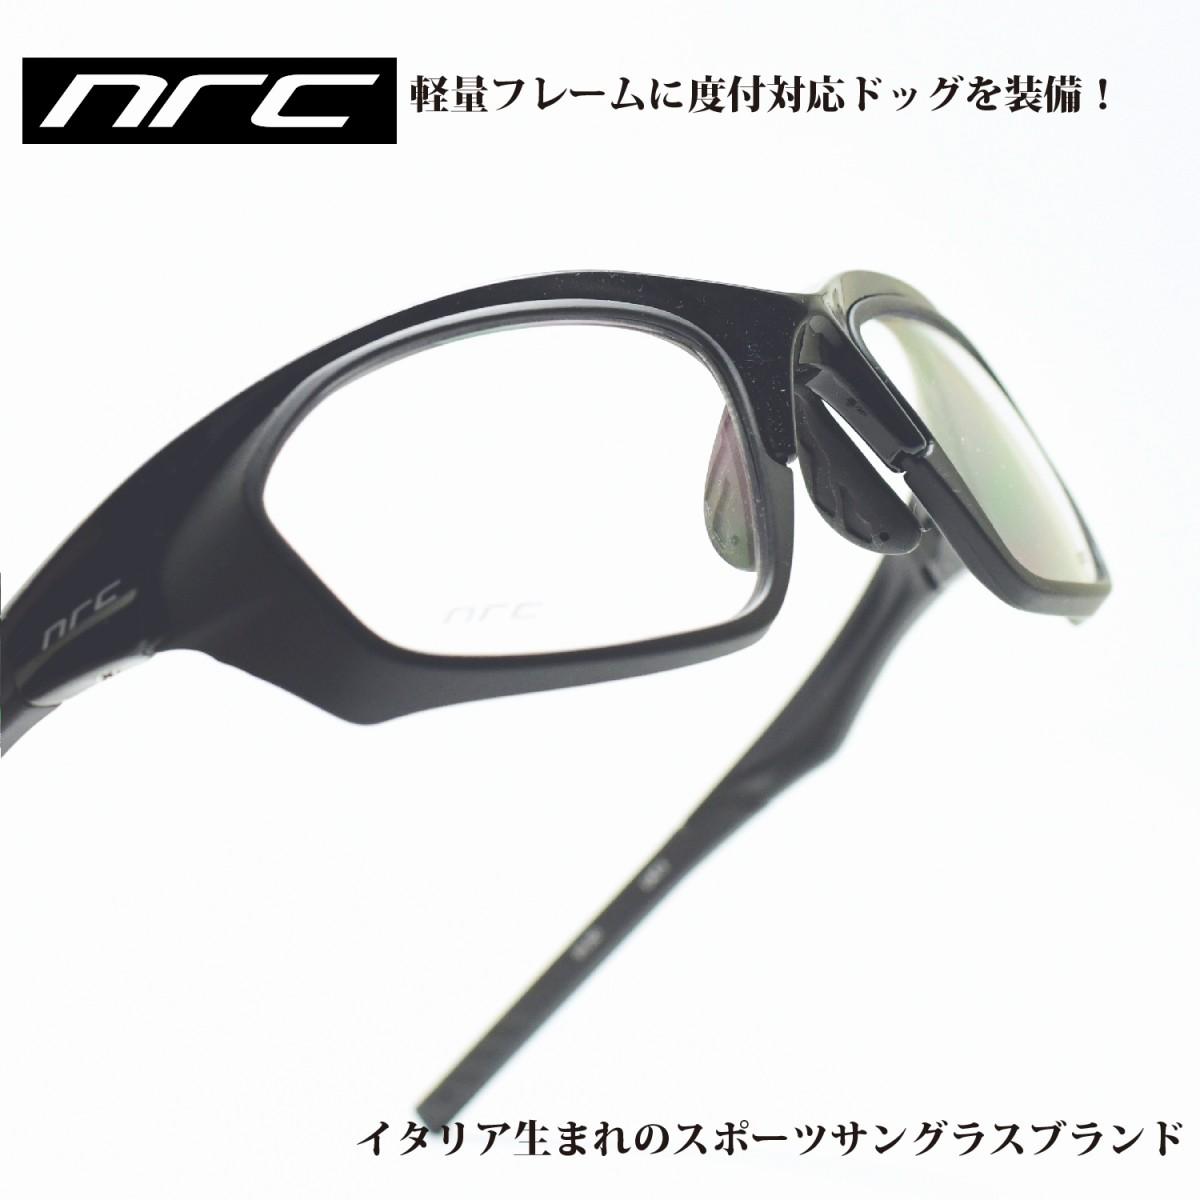 nrc エヌアールシー S5SHINY BLACK/OPTICAL DOCメガネ 眼鏡 めがね メンズ レディース おしゃれ ブランド人気 おすすめ フレーム 流行り 度付き レンズ サングラス